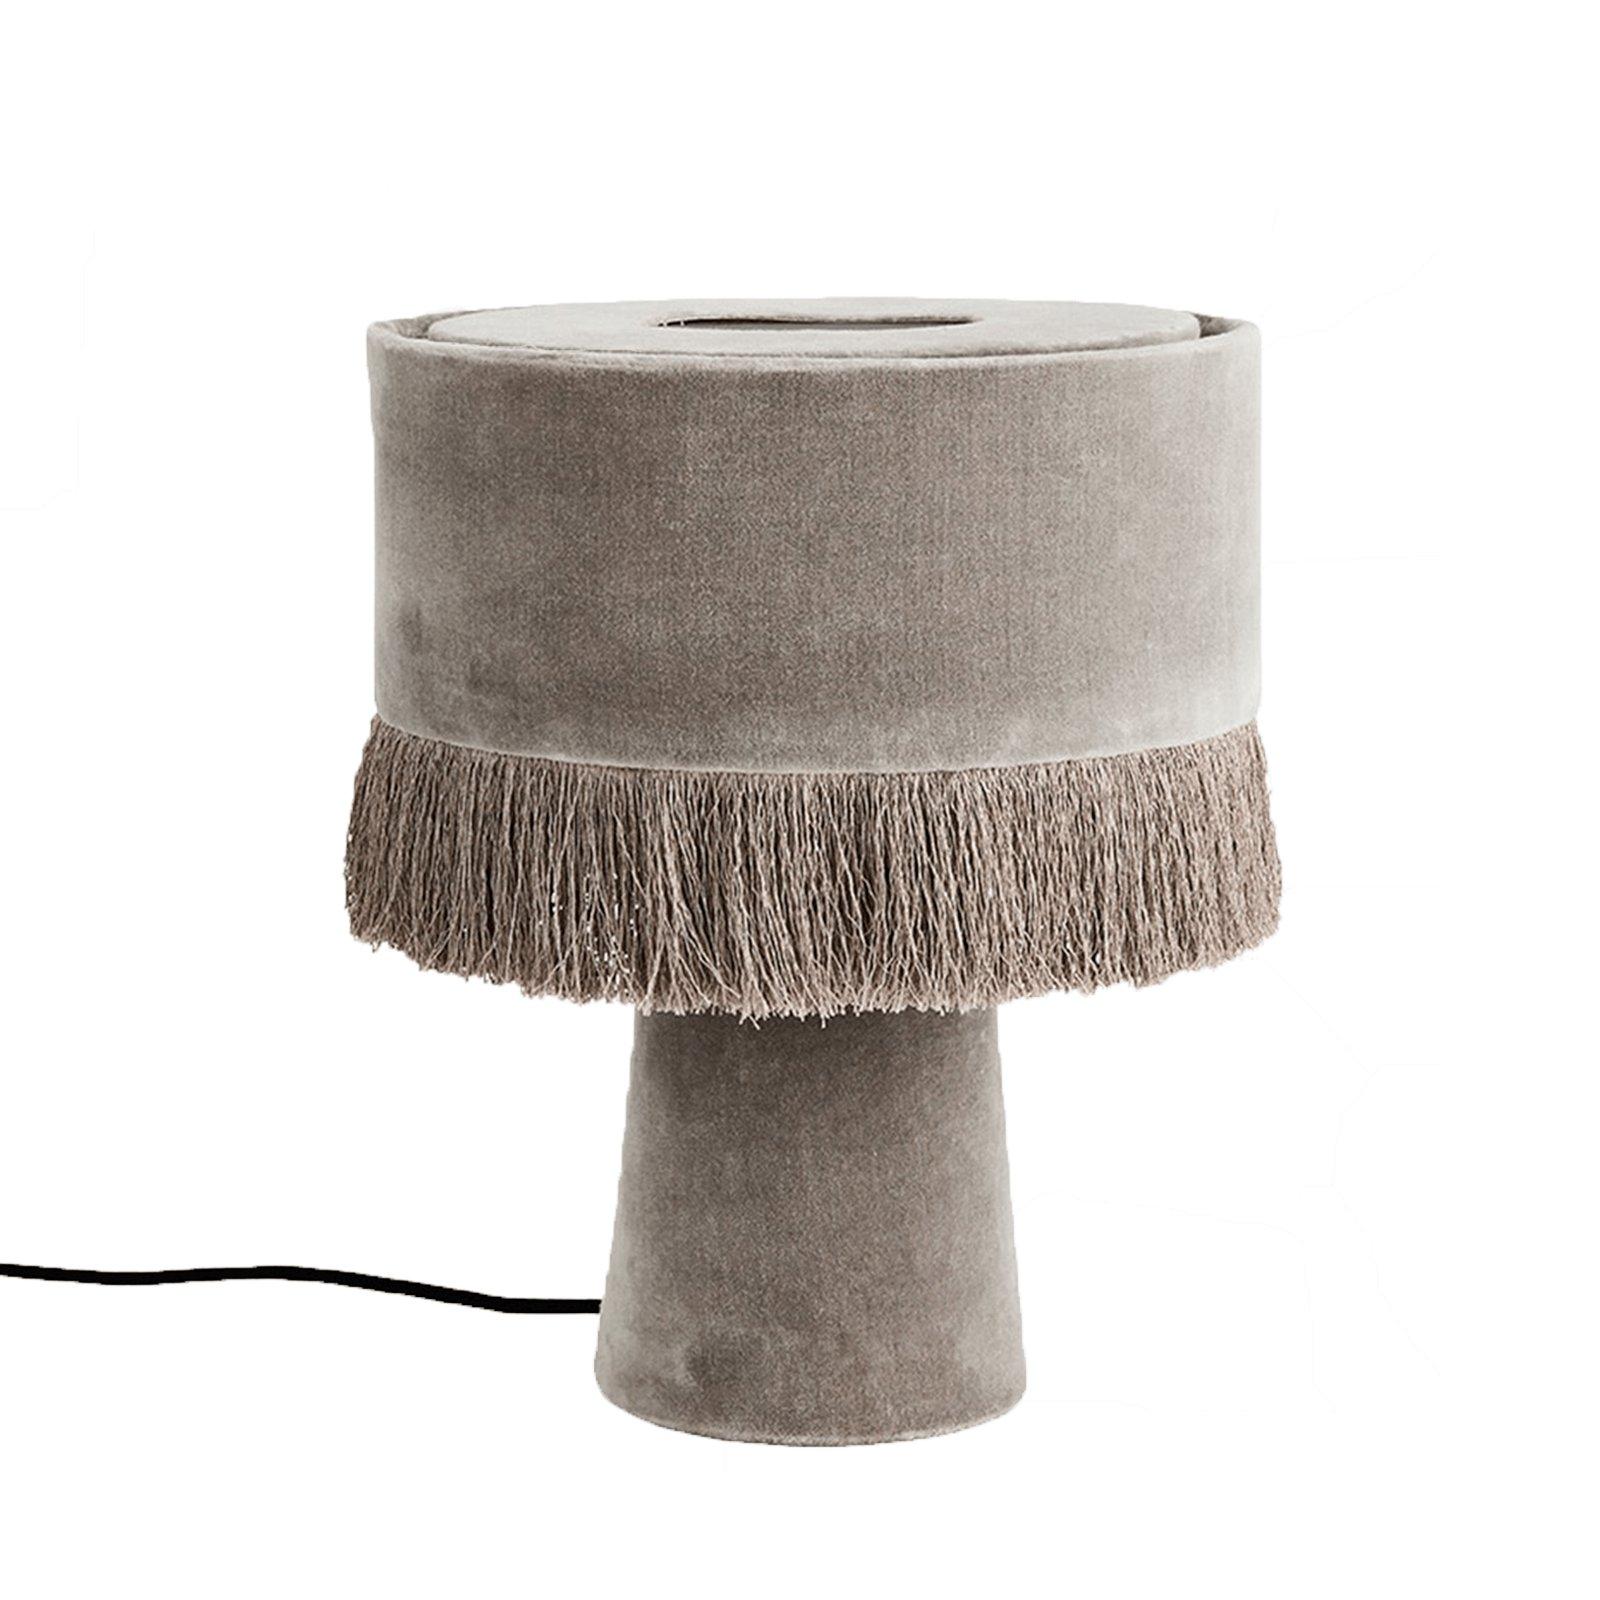 image-MARAIS TABLE LAMP IN GREY